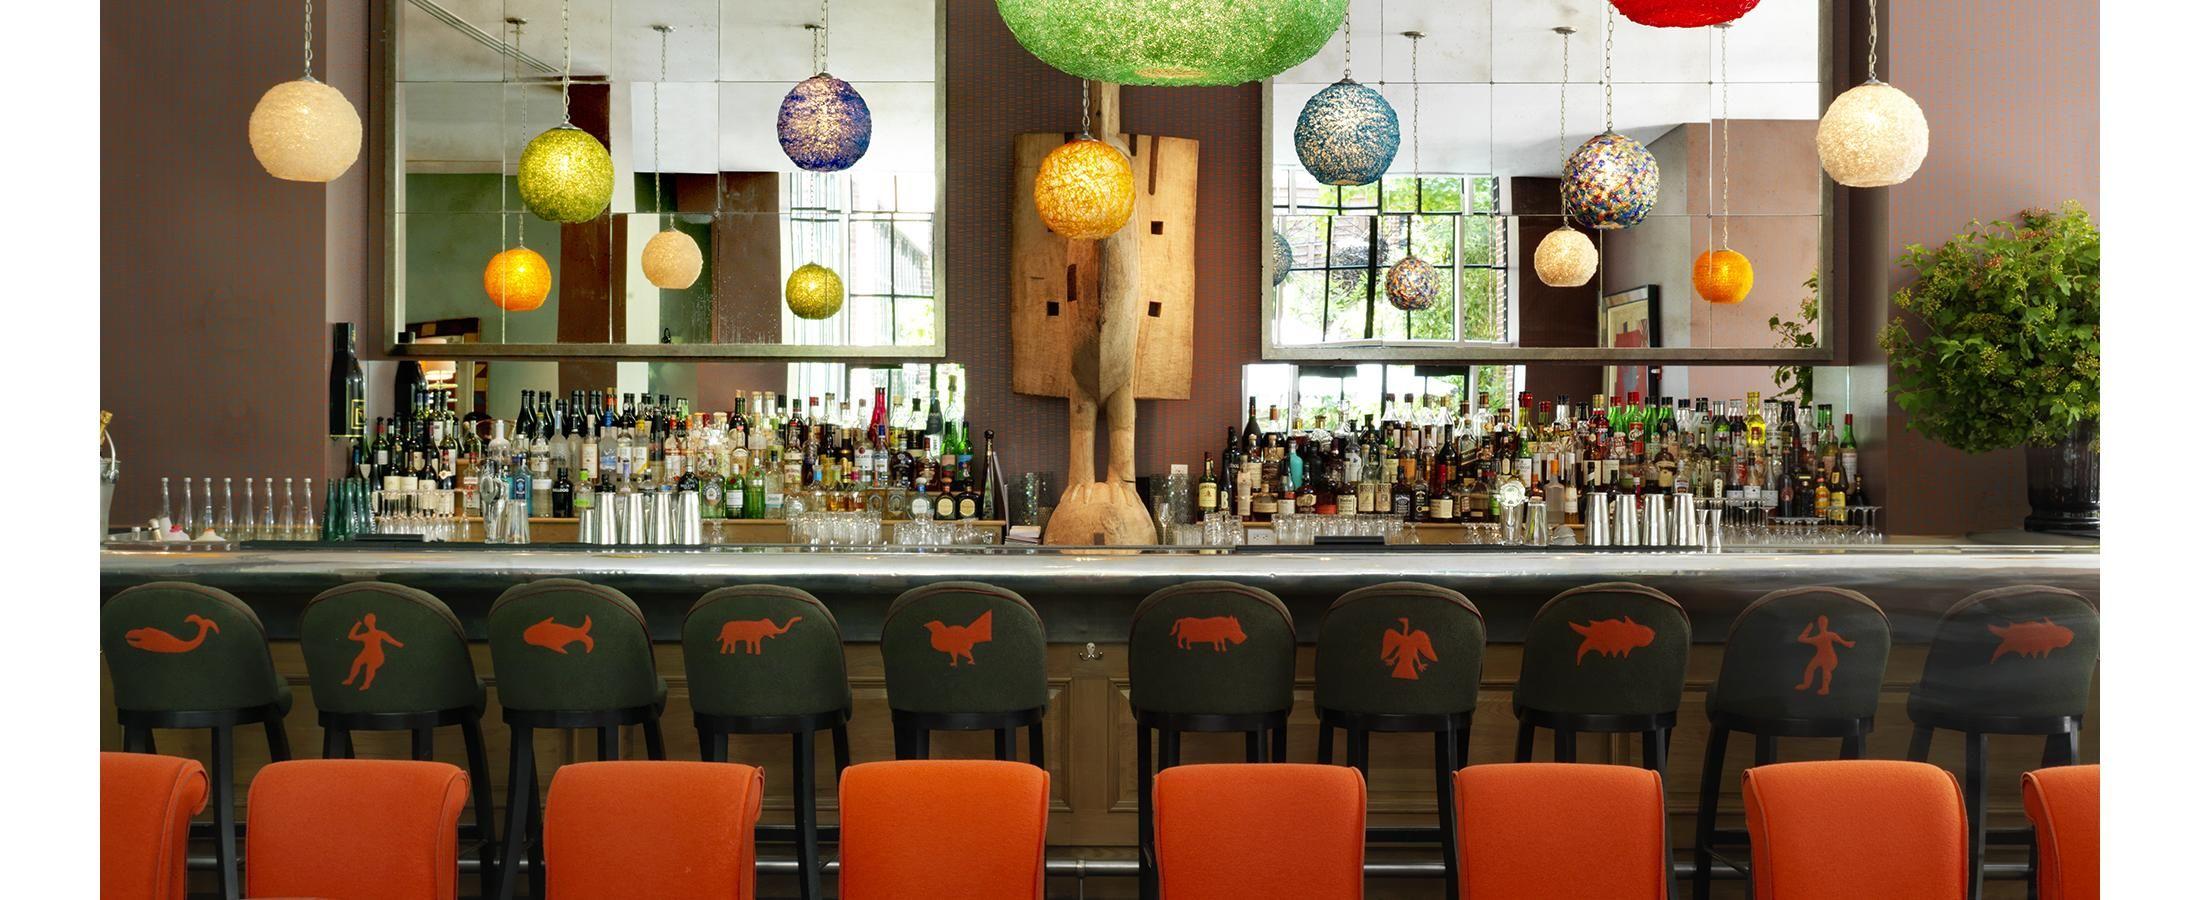 Interior Designer Of The Year Award Winner Profile Kit Kemp Mbe Andrew Martin Crosby Street Firmdale Hotels Nyc Bars